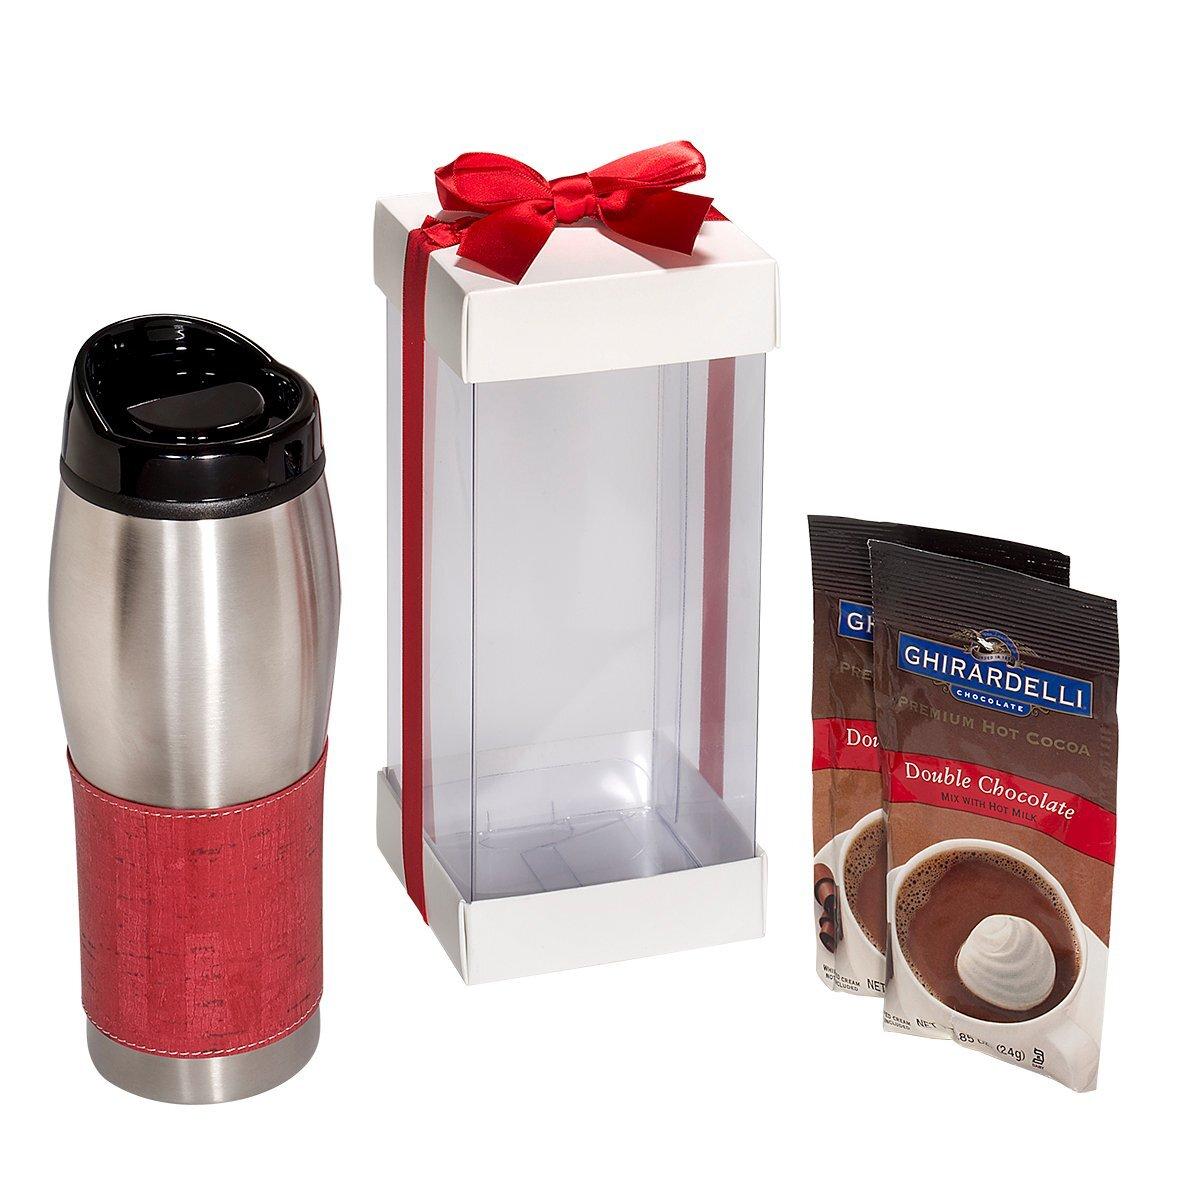 Casablanca™ Tumbler & Ghirardelli® Cocoa Gift Set